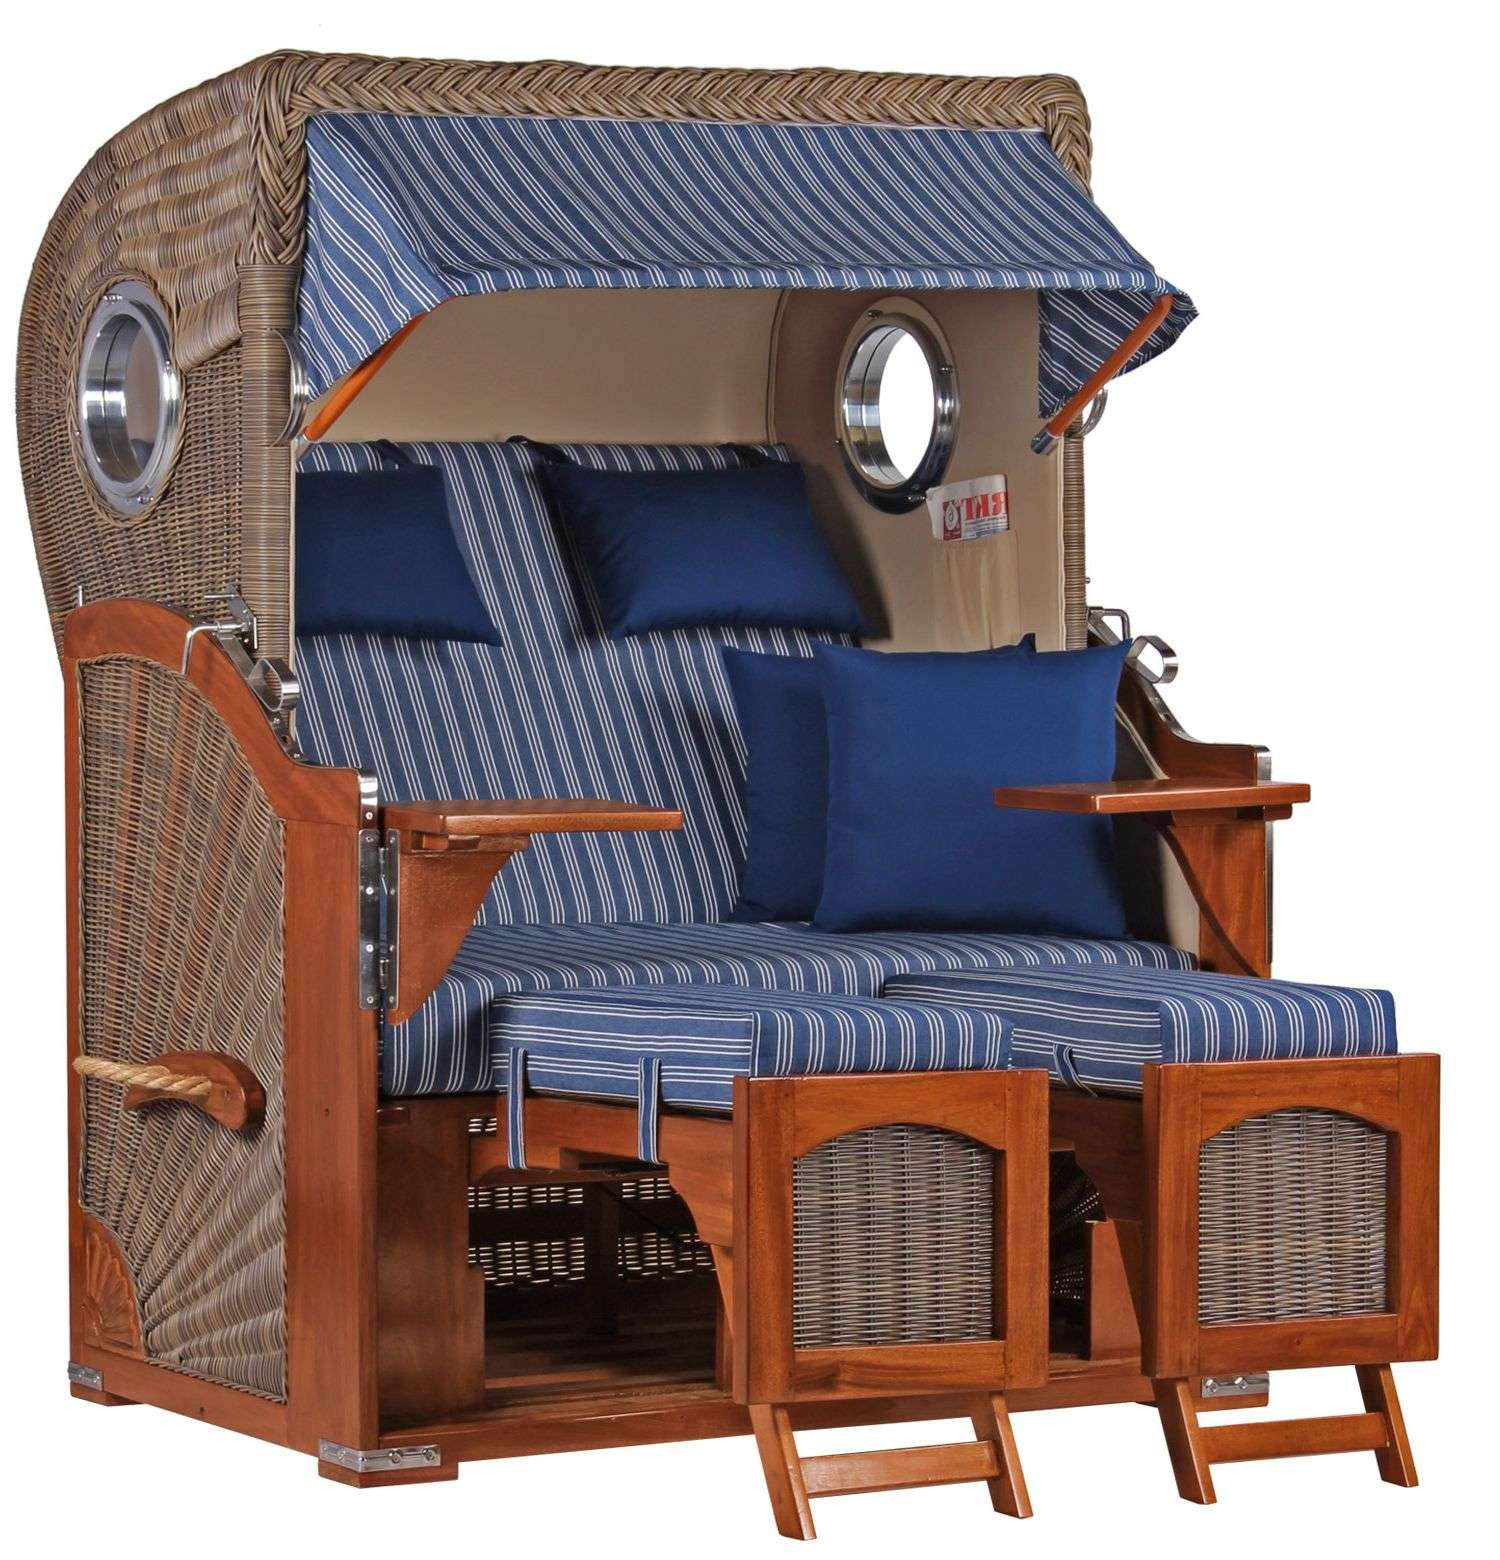 inspiration tropenholz terrasse schema terrasse design ideen. Black Bedroom Furniture Sets. Home Design Ideas